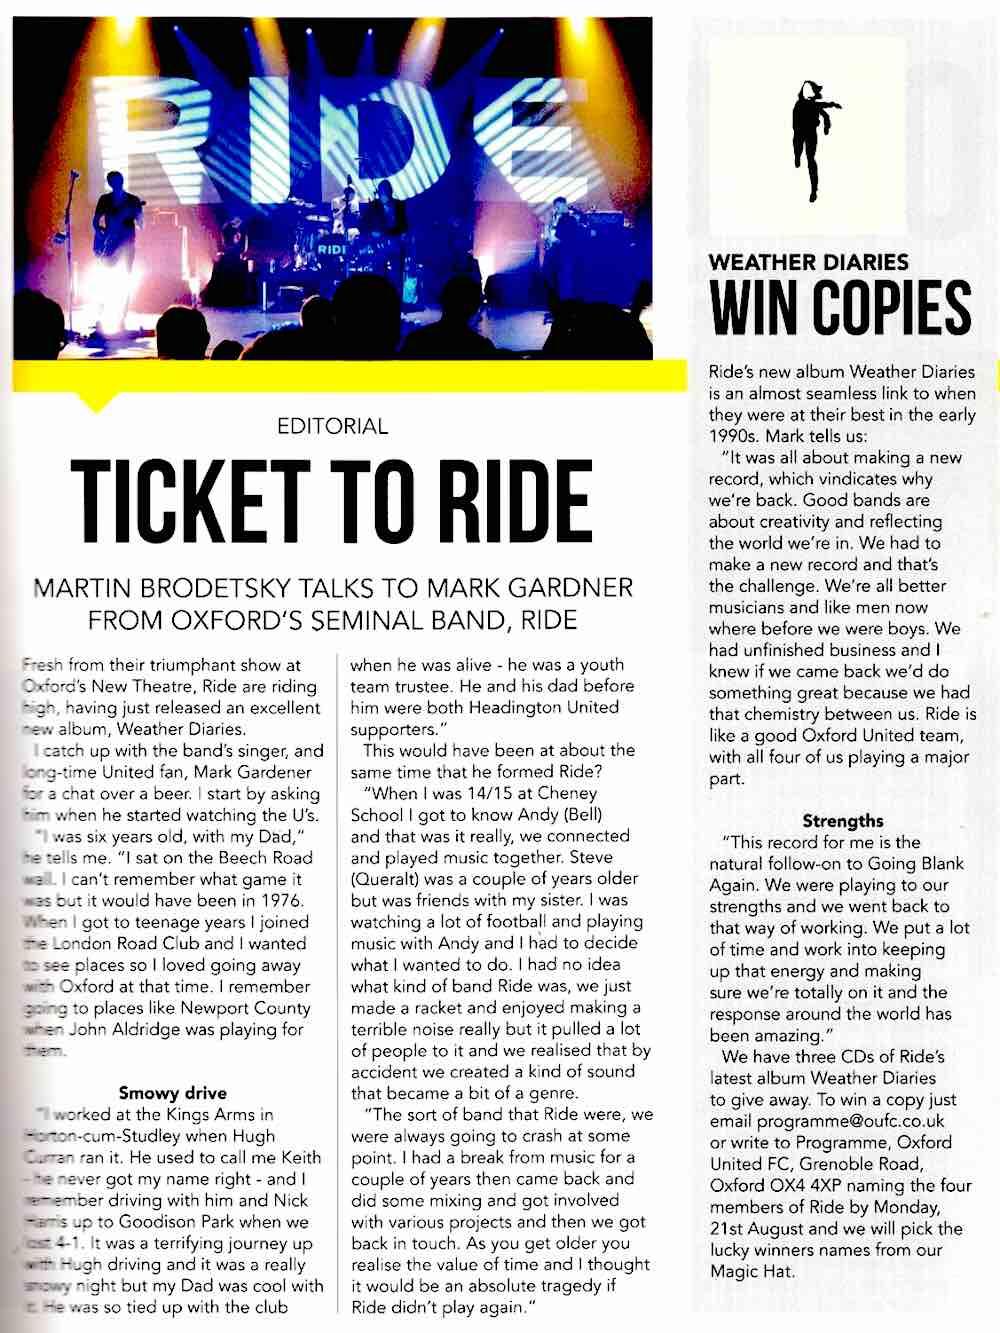 Oxford United magazine interview